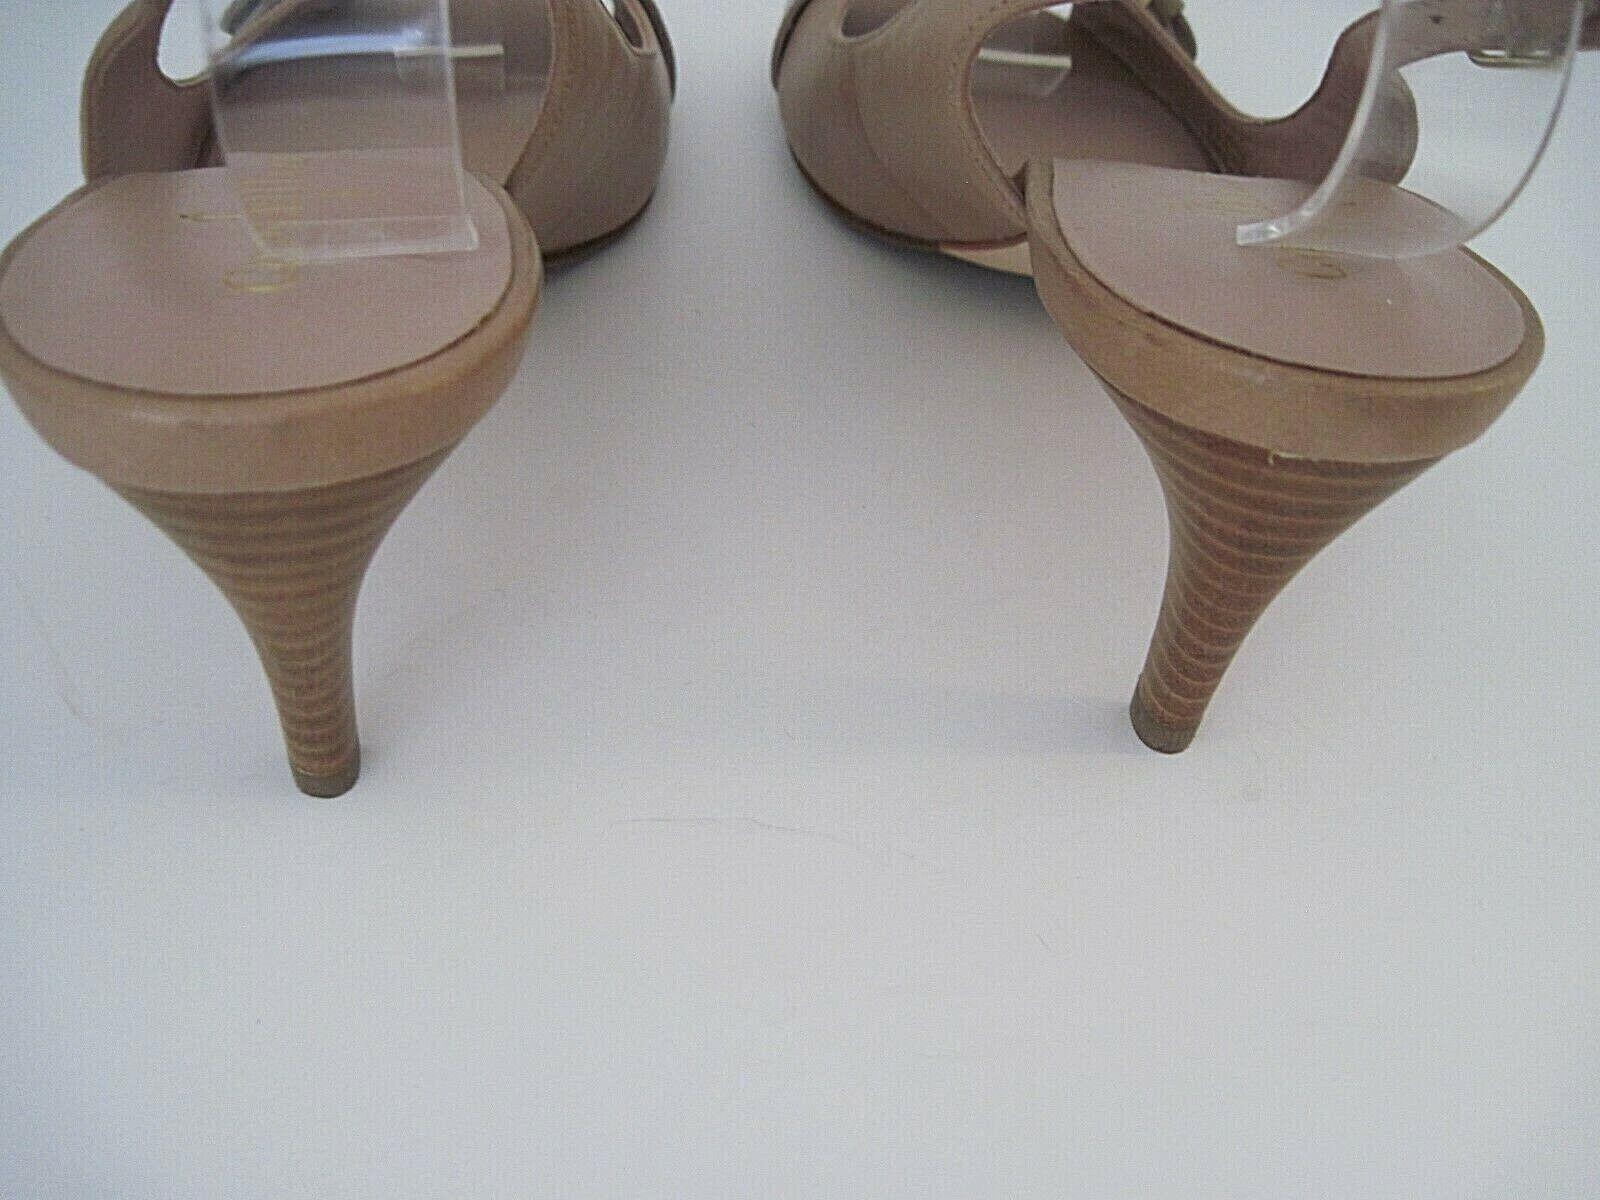 Cole Haan Nke Air damen Maple Maple Maple Sugar Leather Slingback Open Toe Pump 8 1 2B, NEW bb454a